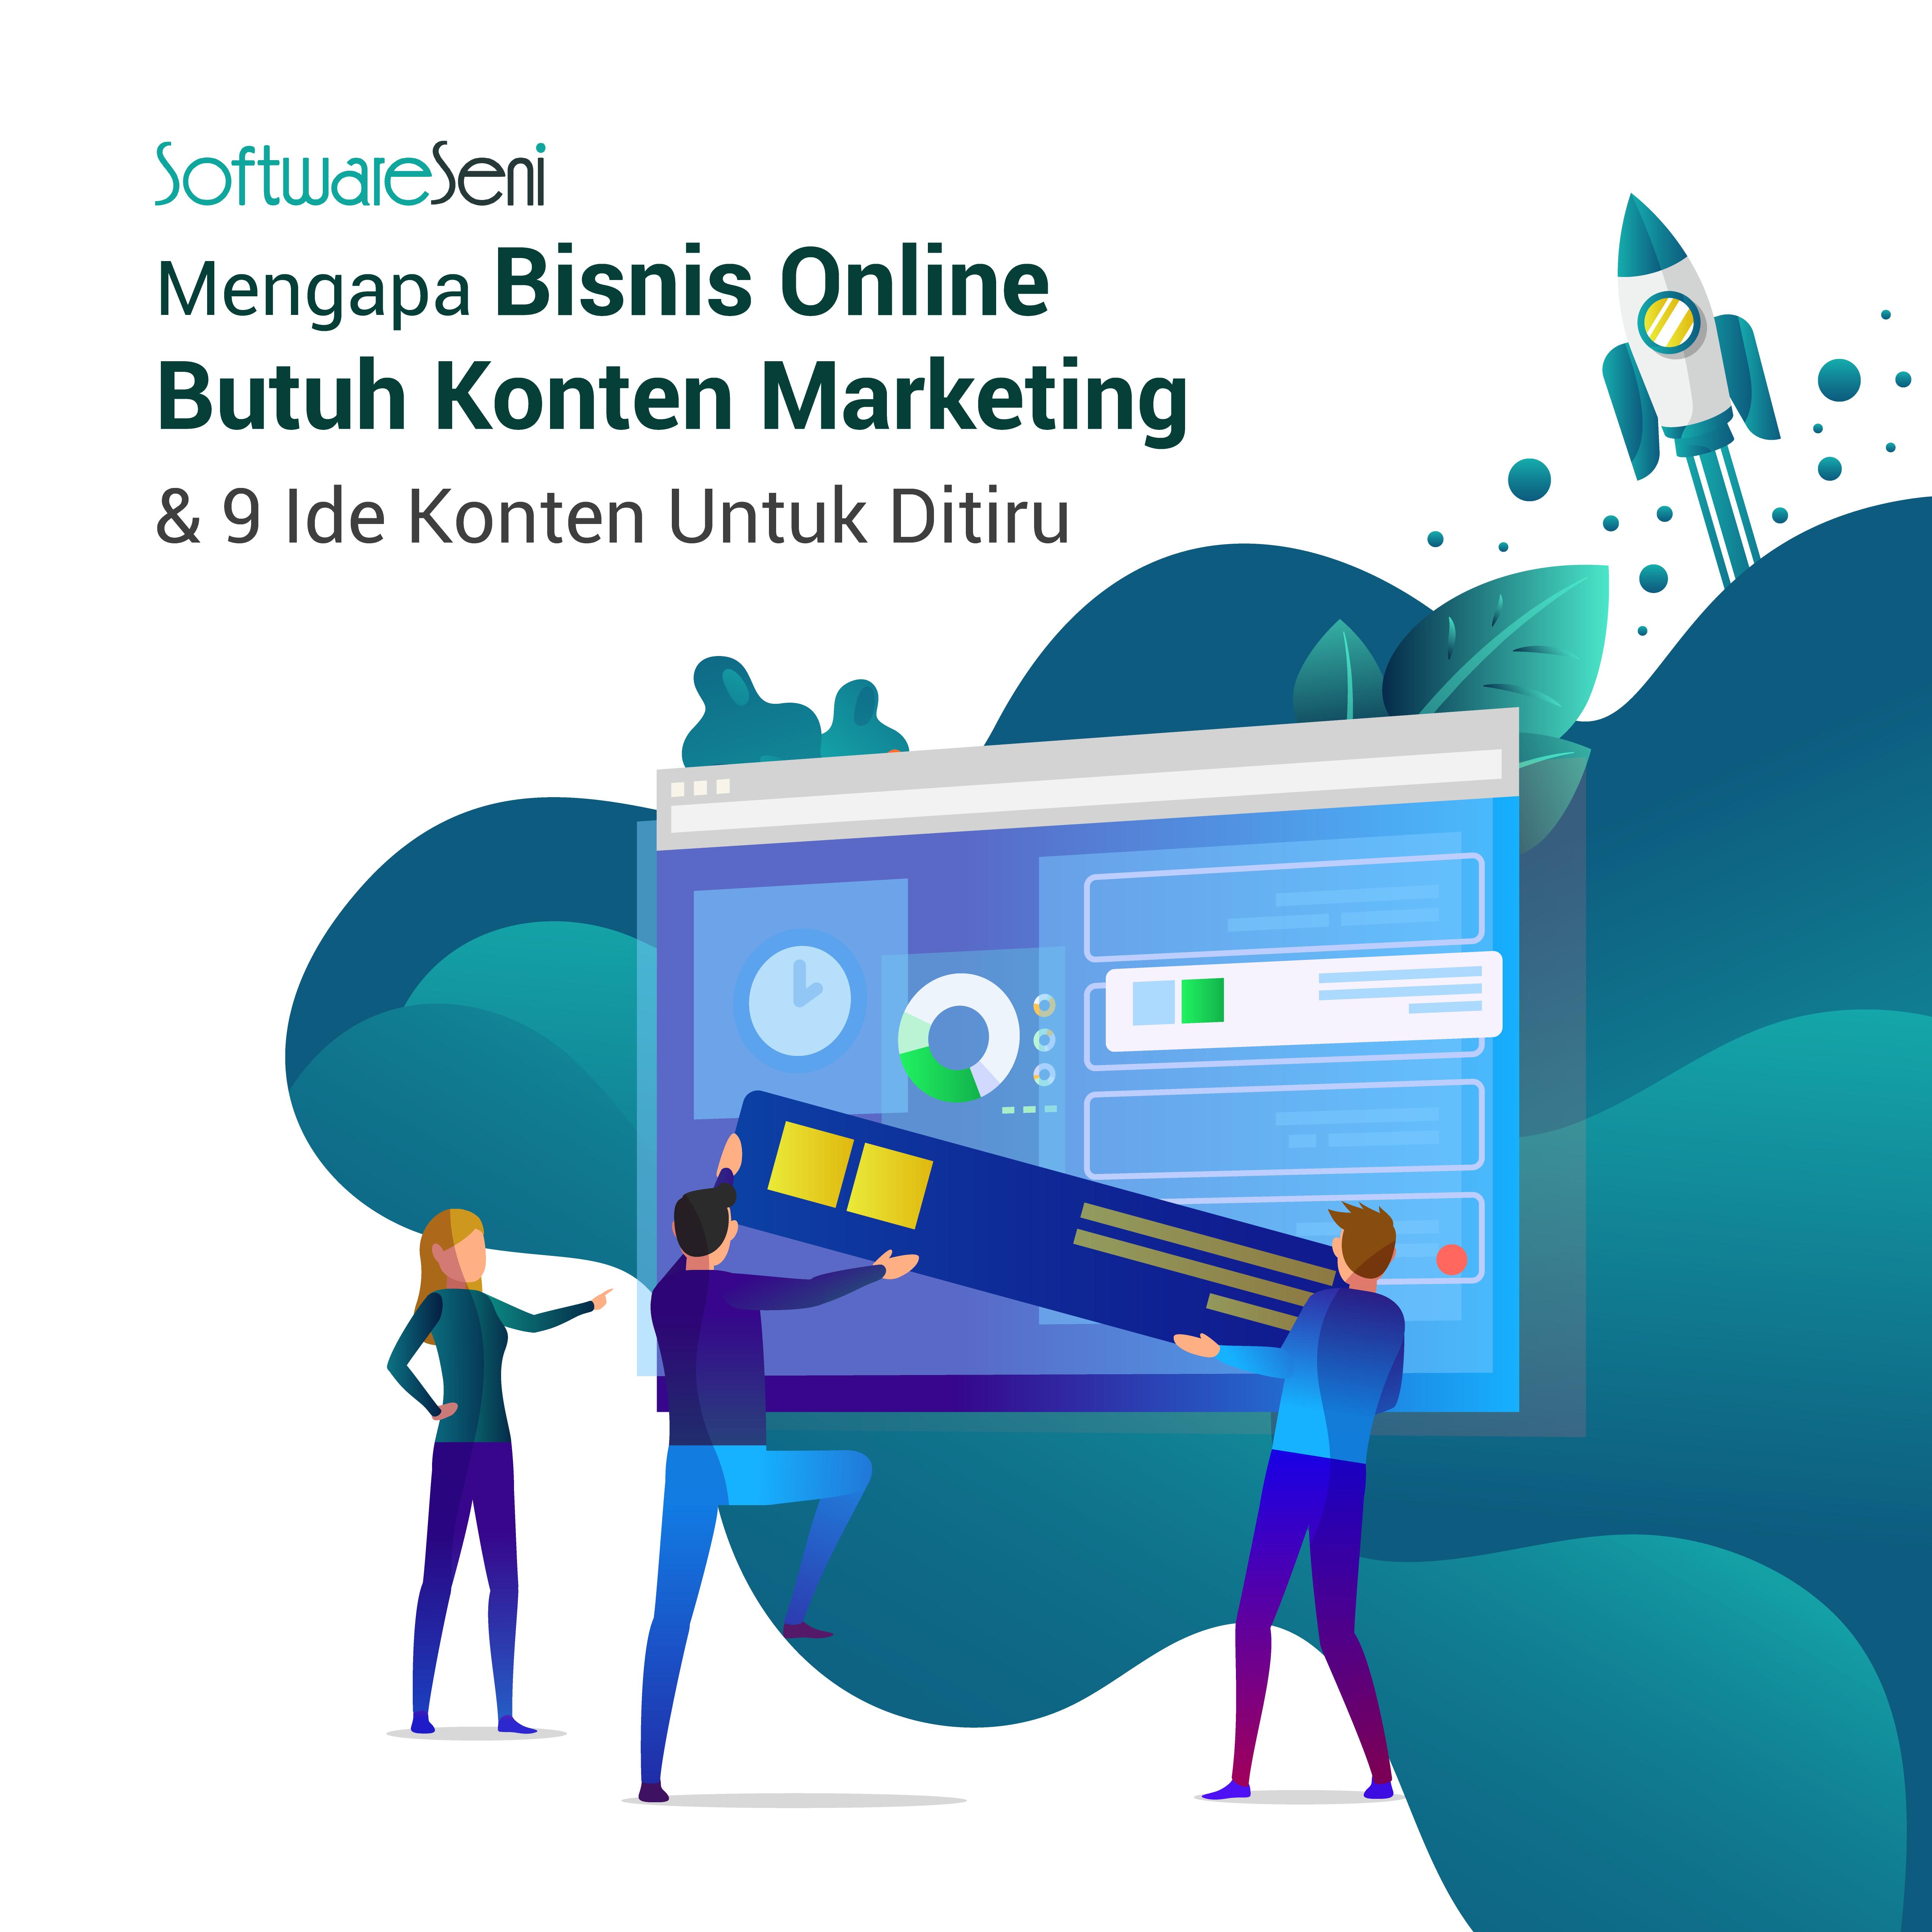 Mengapa Bisnis Online Butuh Konten Marketing & 9 Ide Konten Untuk Ditiru